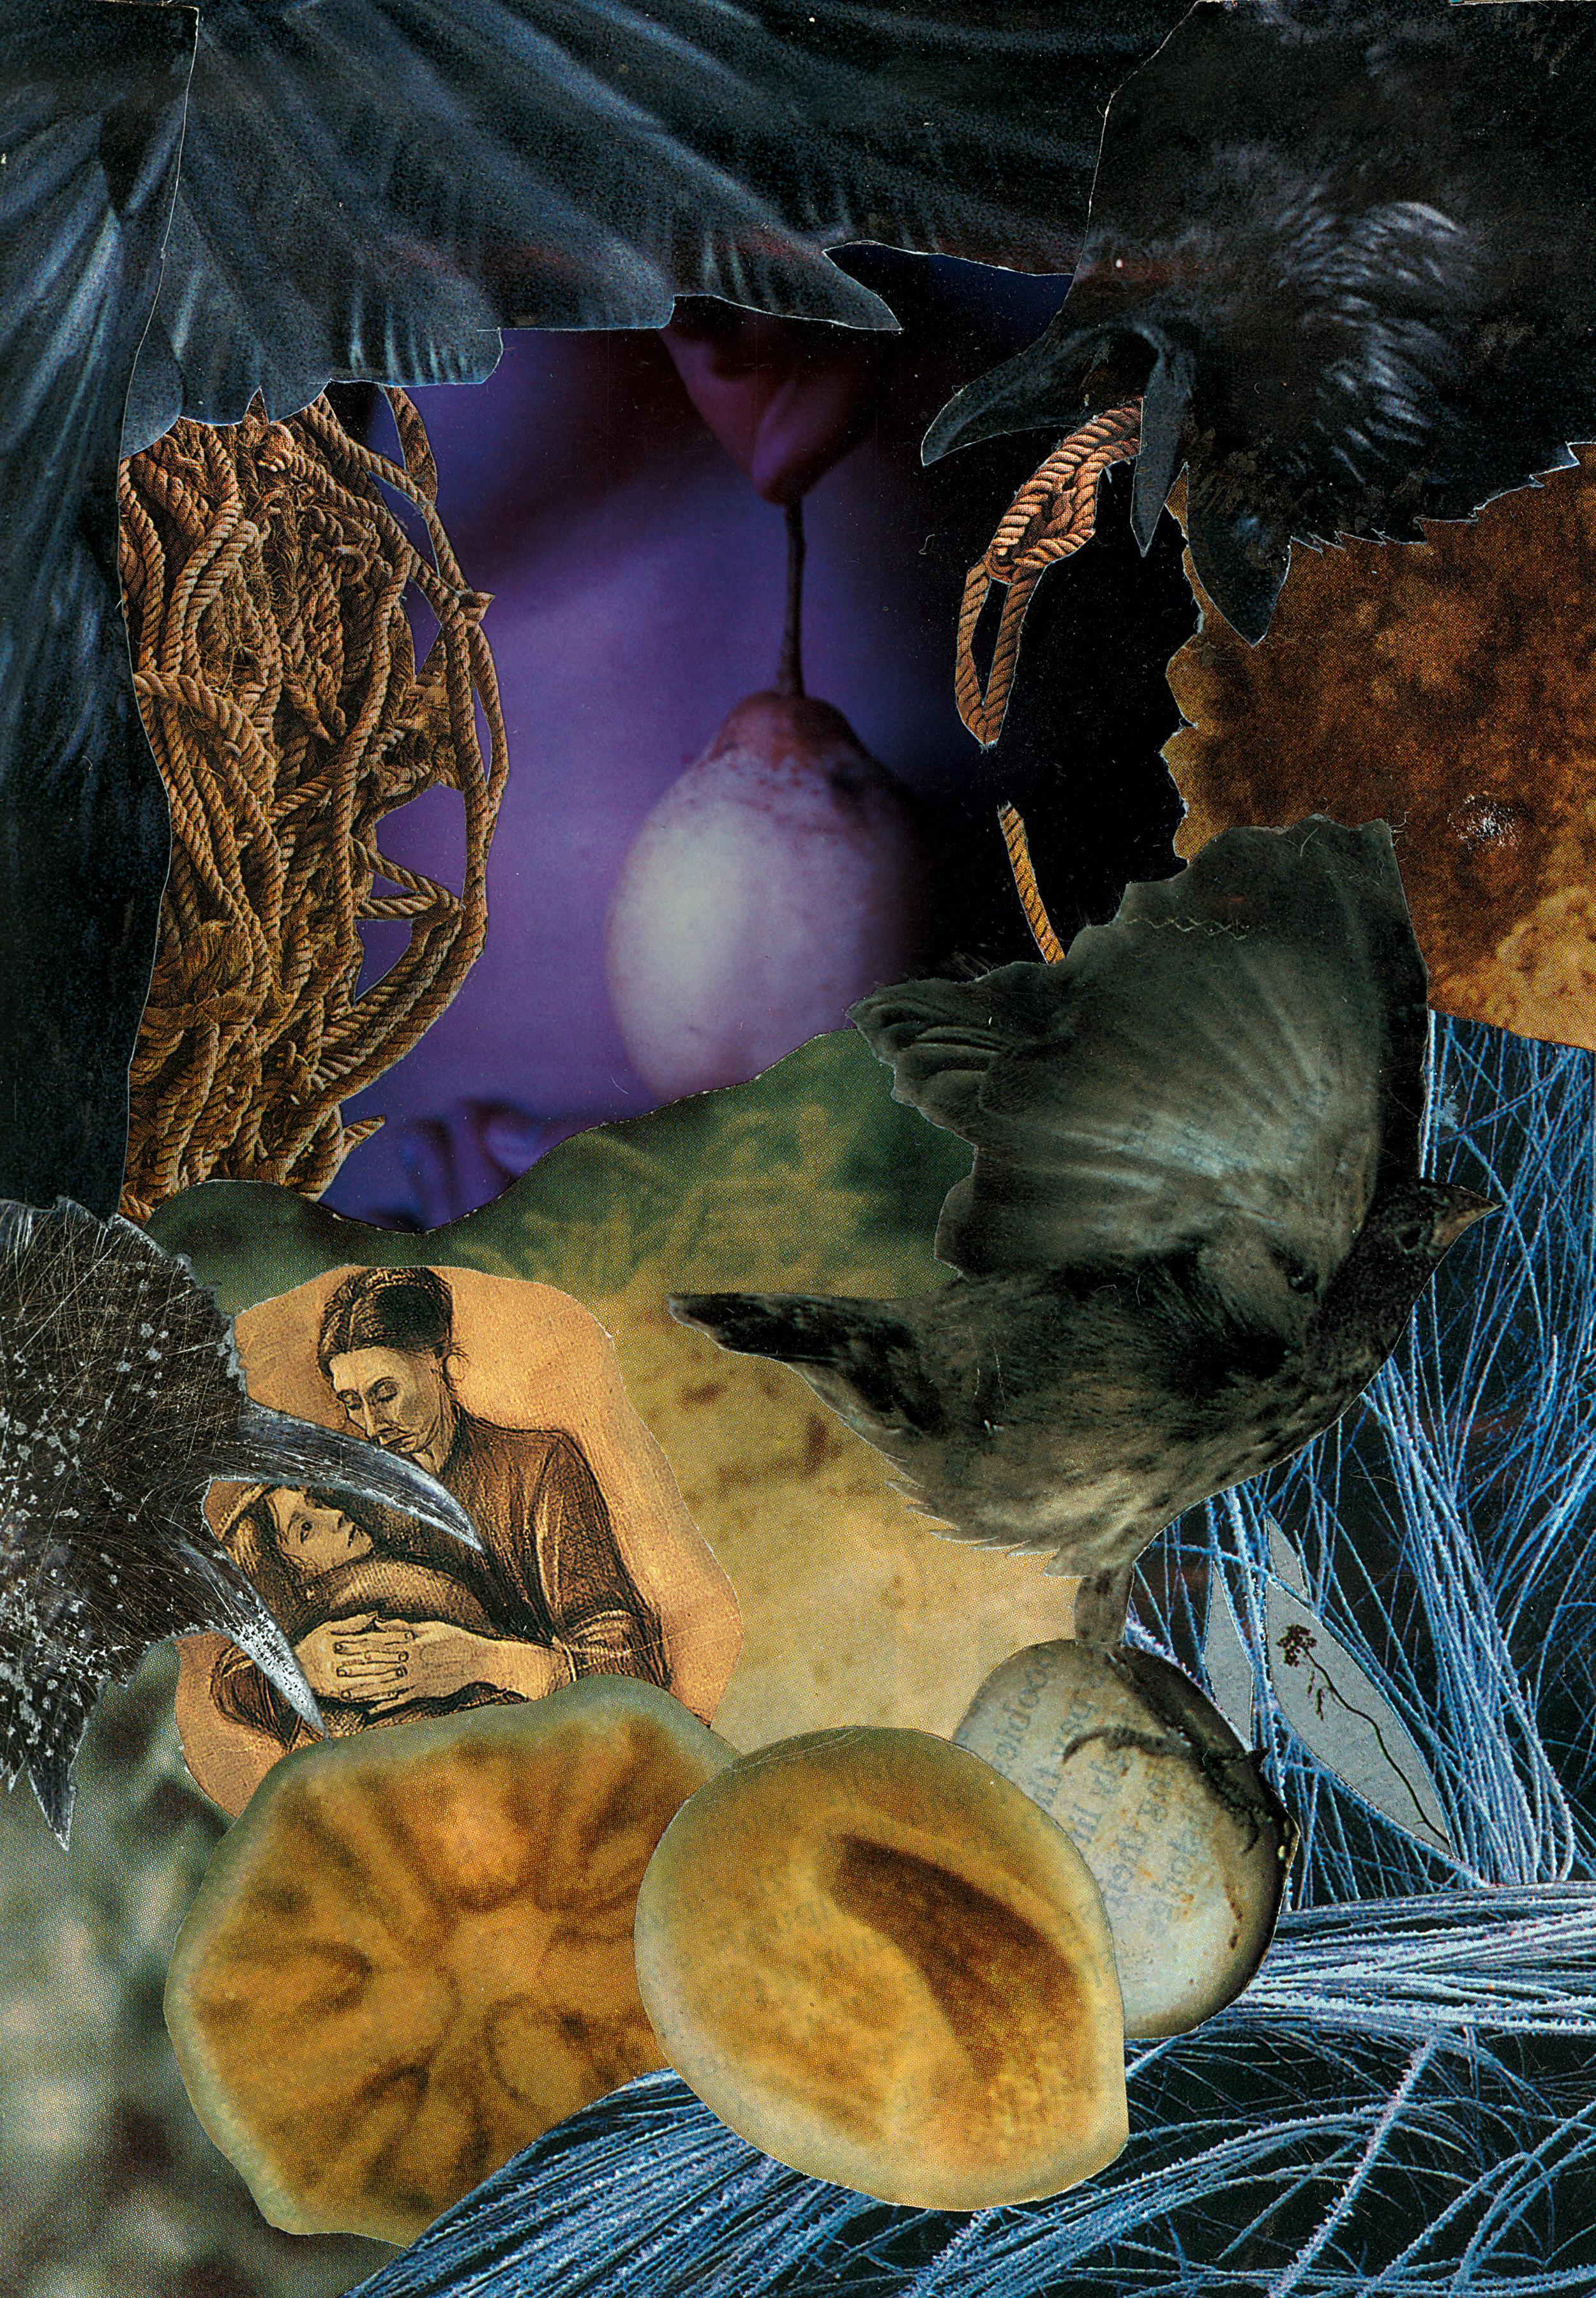 Agnieszka Sosnowska,Birth I, Polaroid Collage, 2003